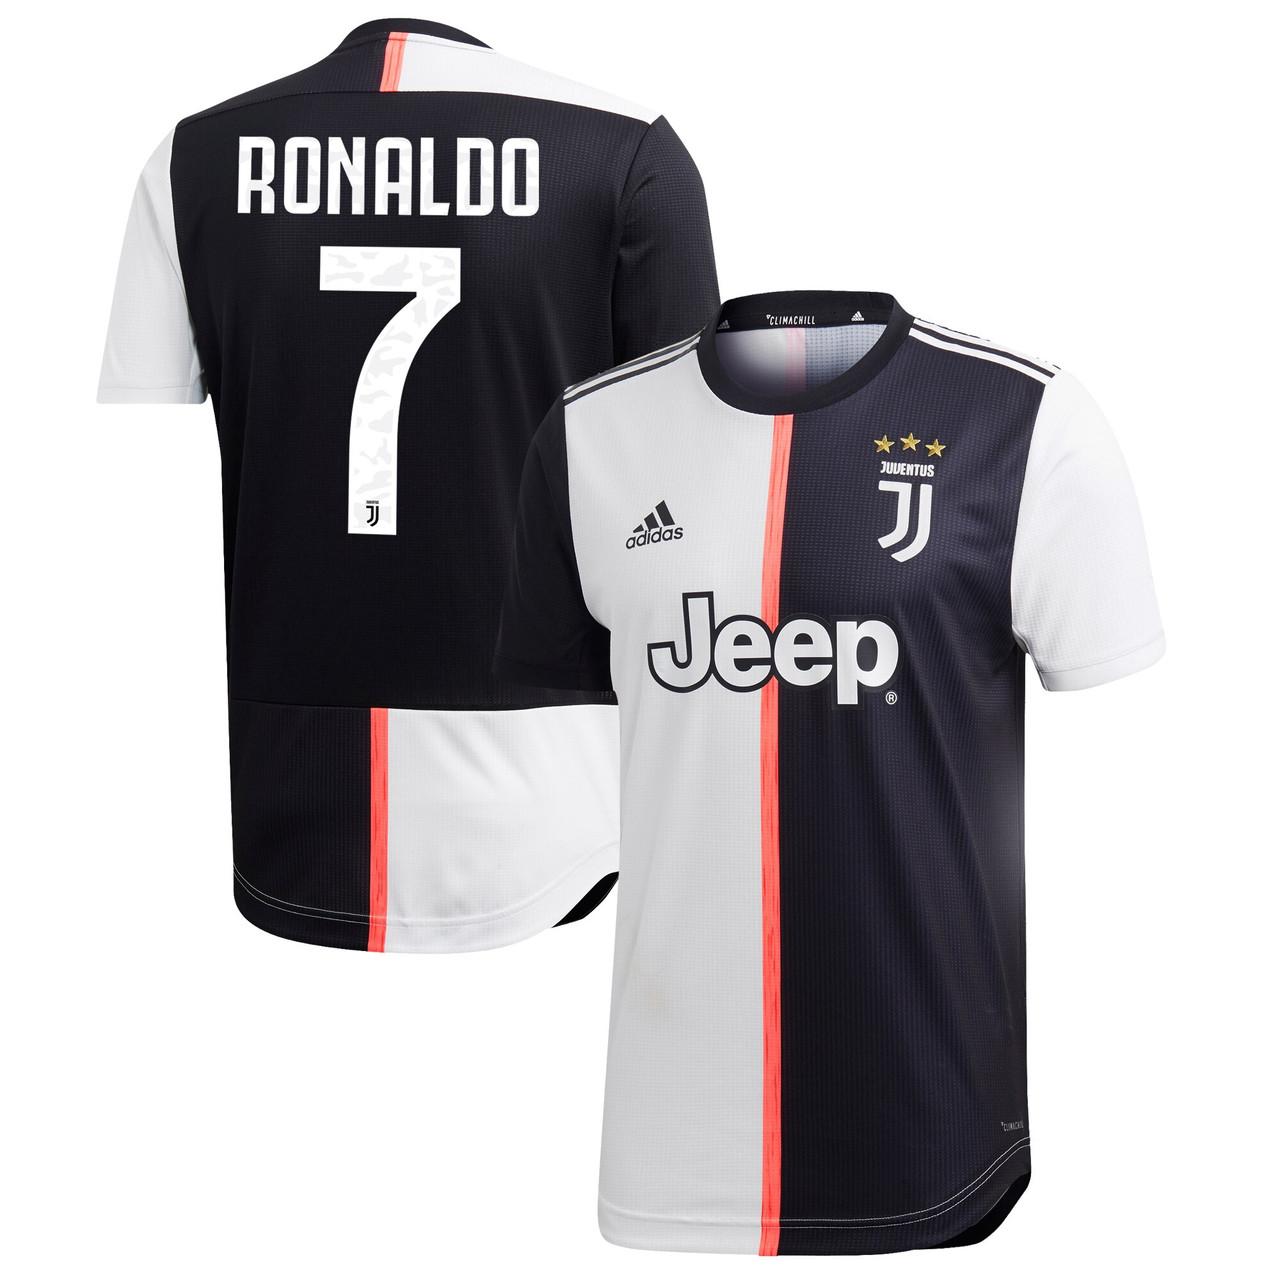 adidas juventus 2020 home authentic ronaldo jersey soccer plus adidas juventus 2020 home authentic ronaldo jersey